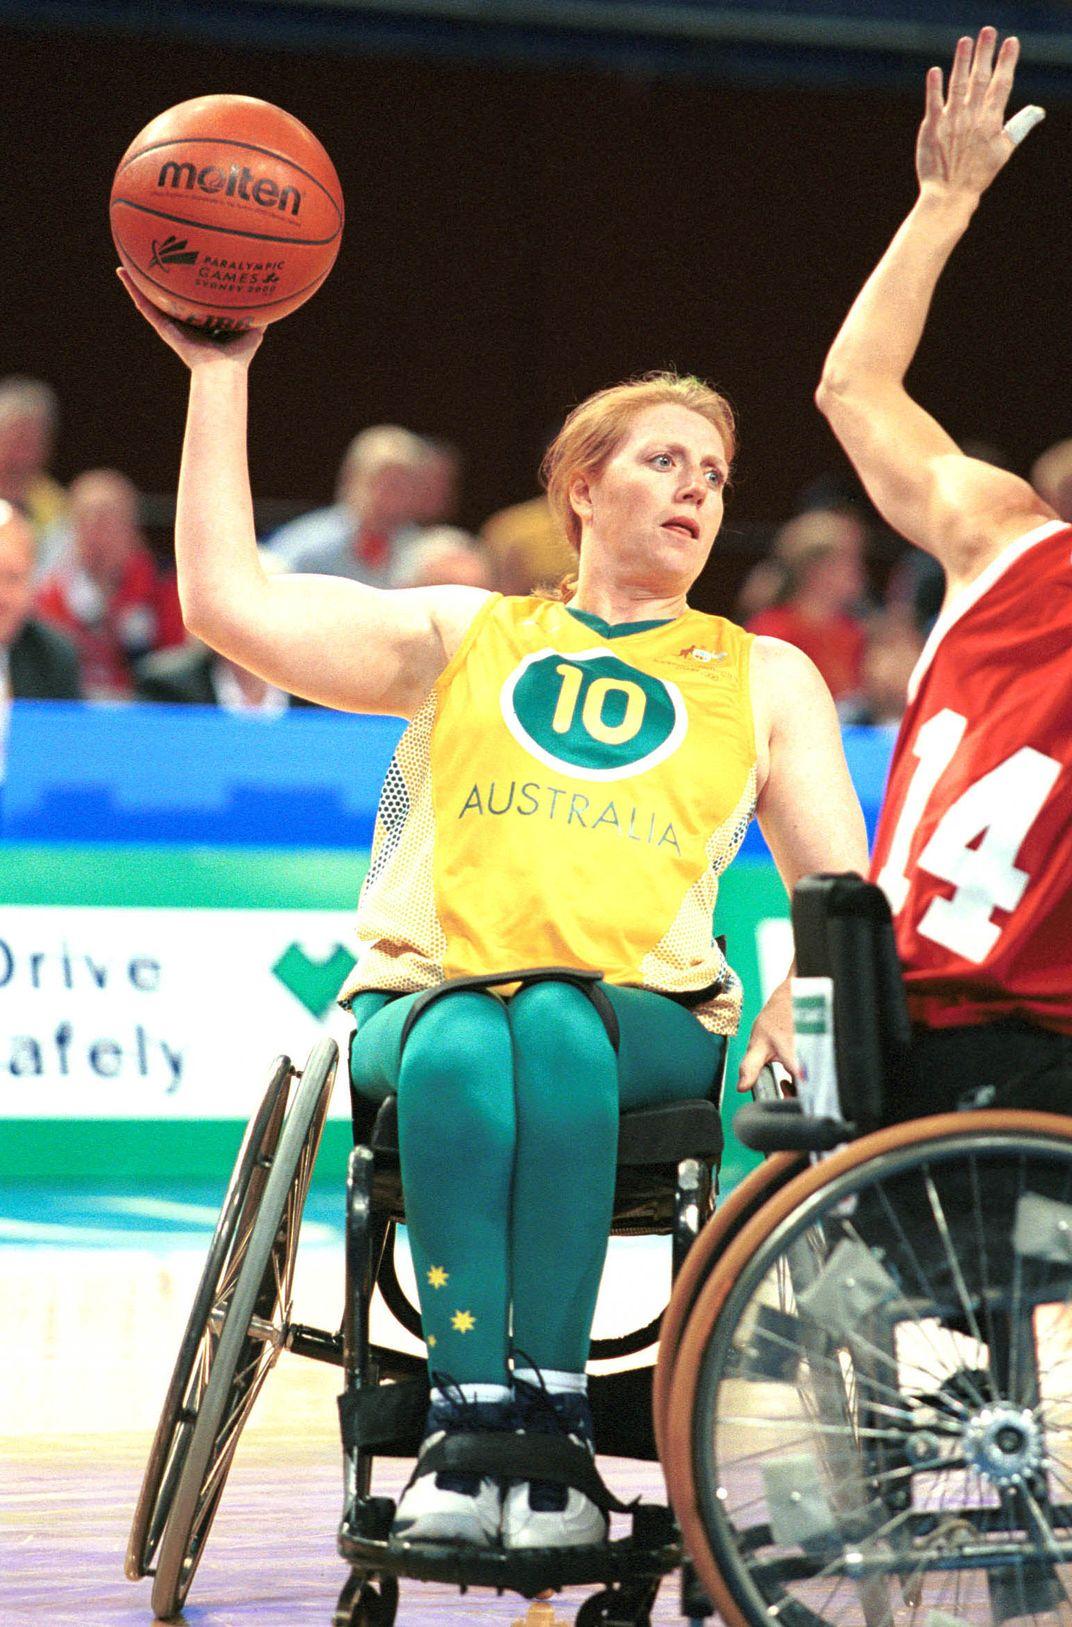 Woman passes ball during wheelchair basketball game